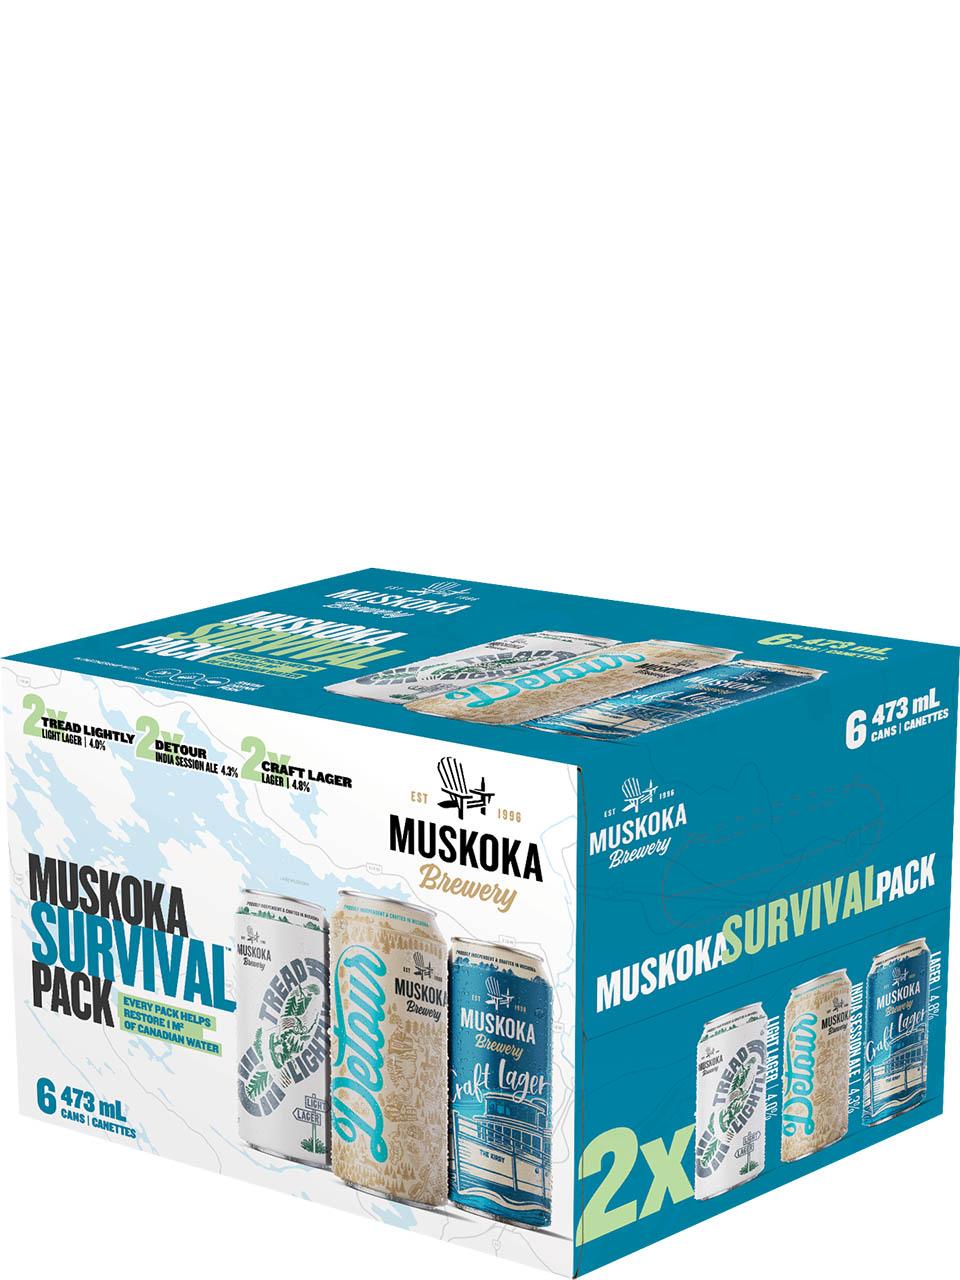 Muskoka Survival Mixer 6 Pack Cans